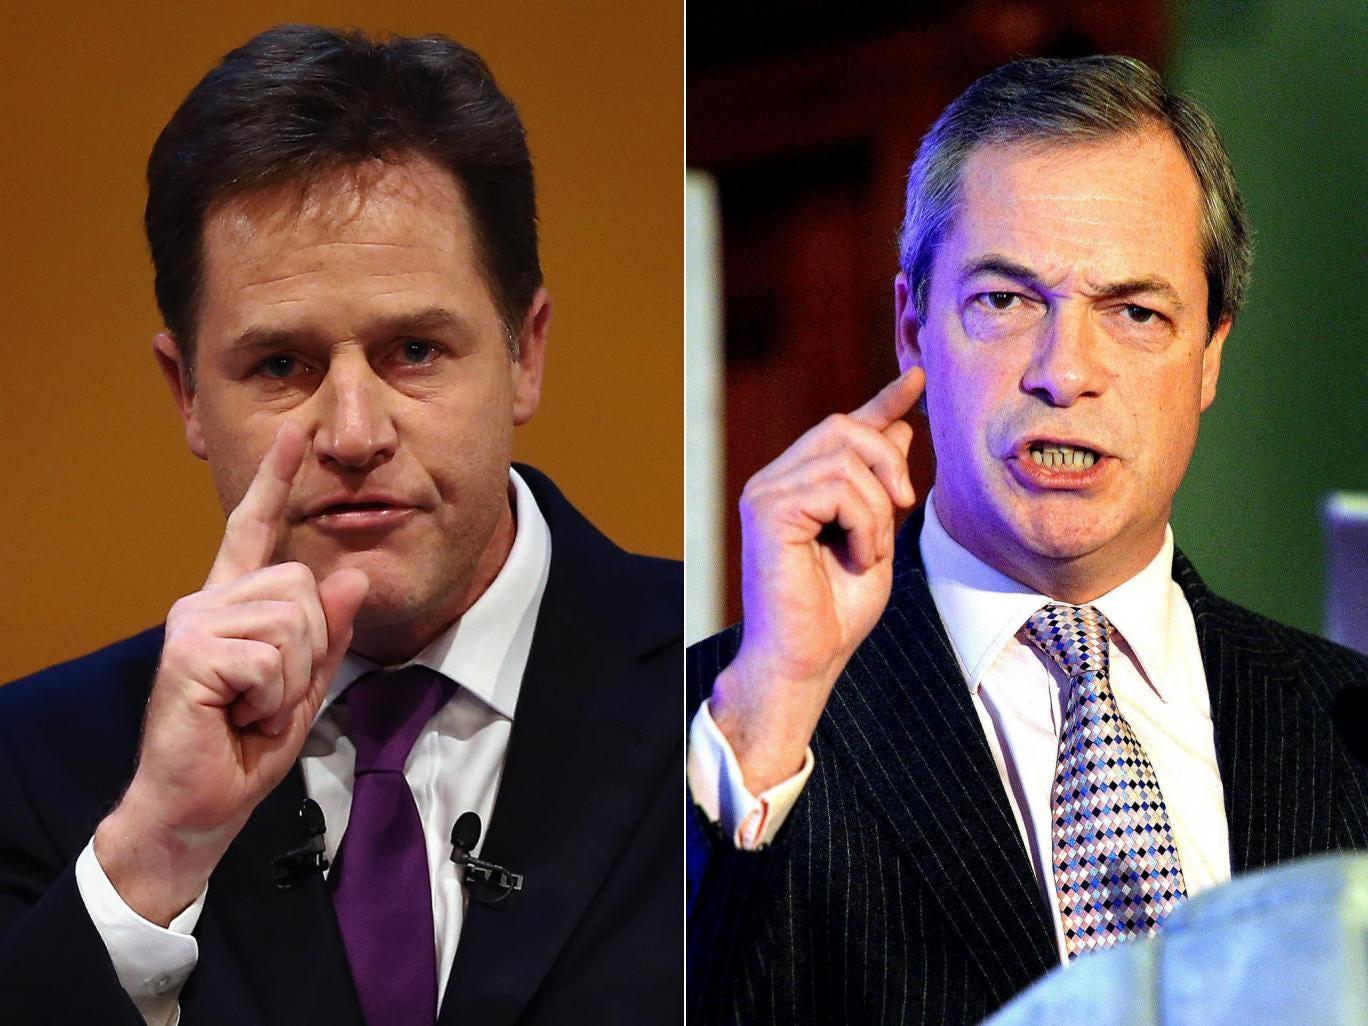 Nick Clegg (left) is calling for a televised debate with Ukip leader Nigel Farage